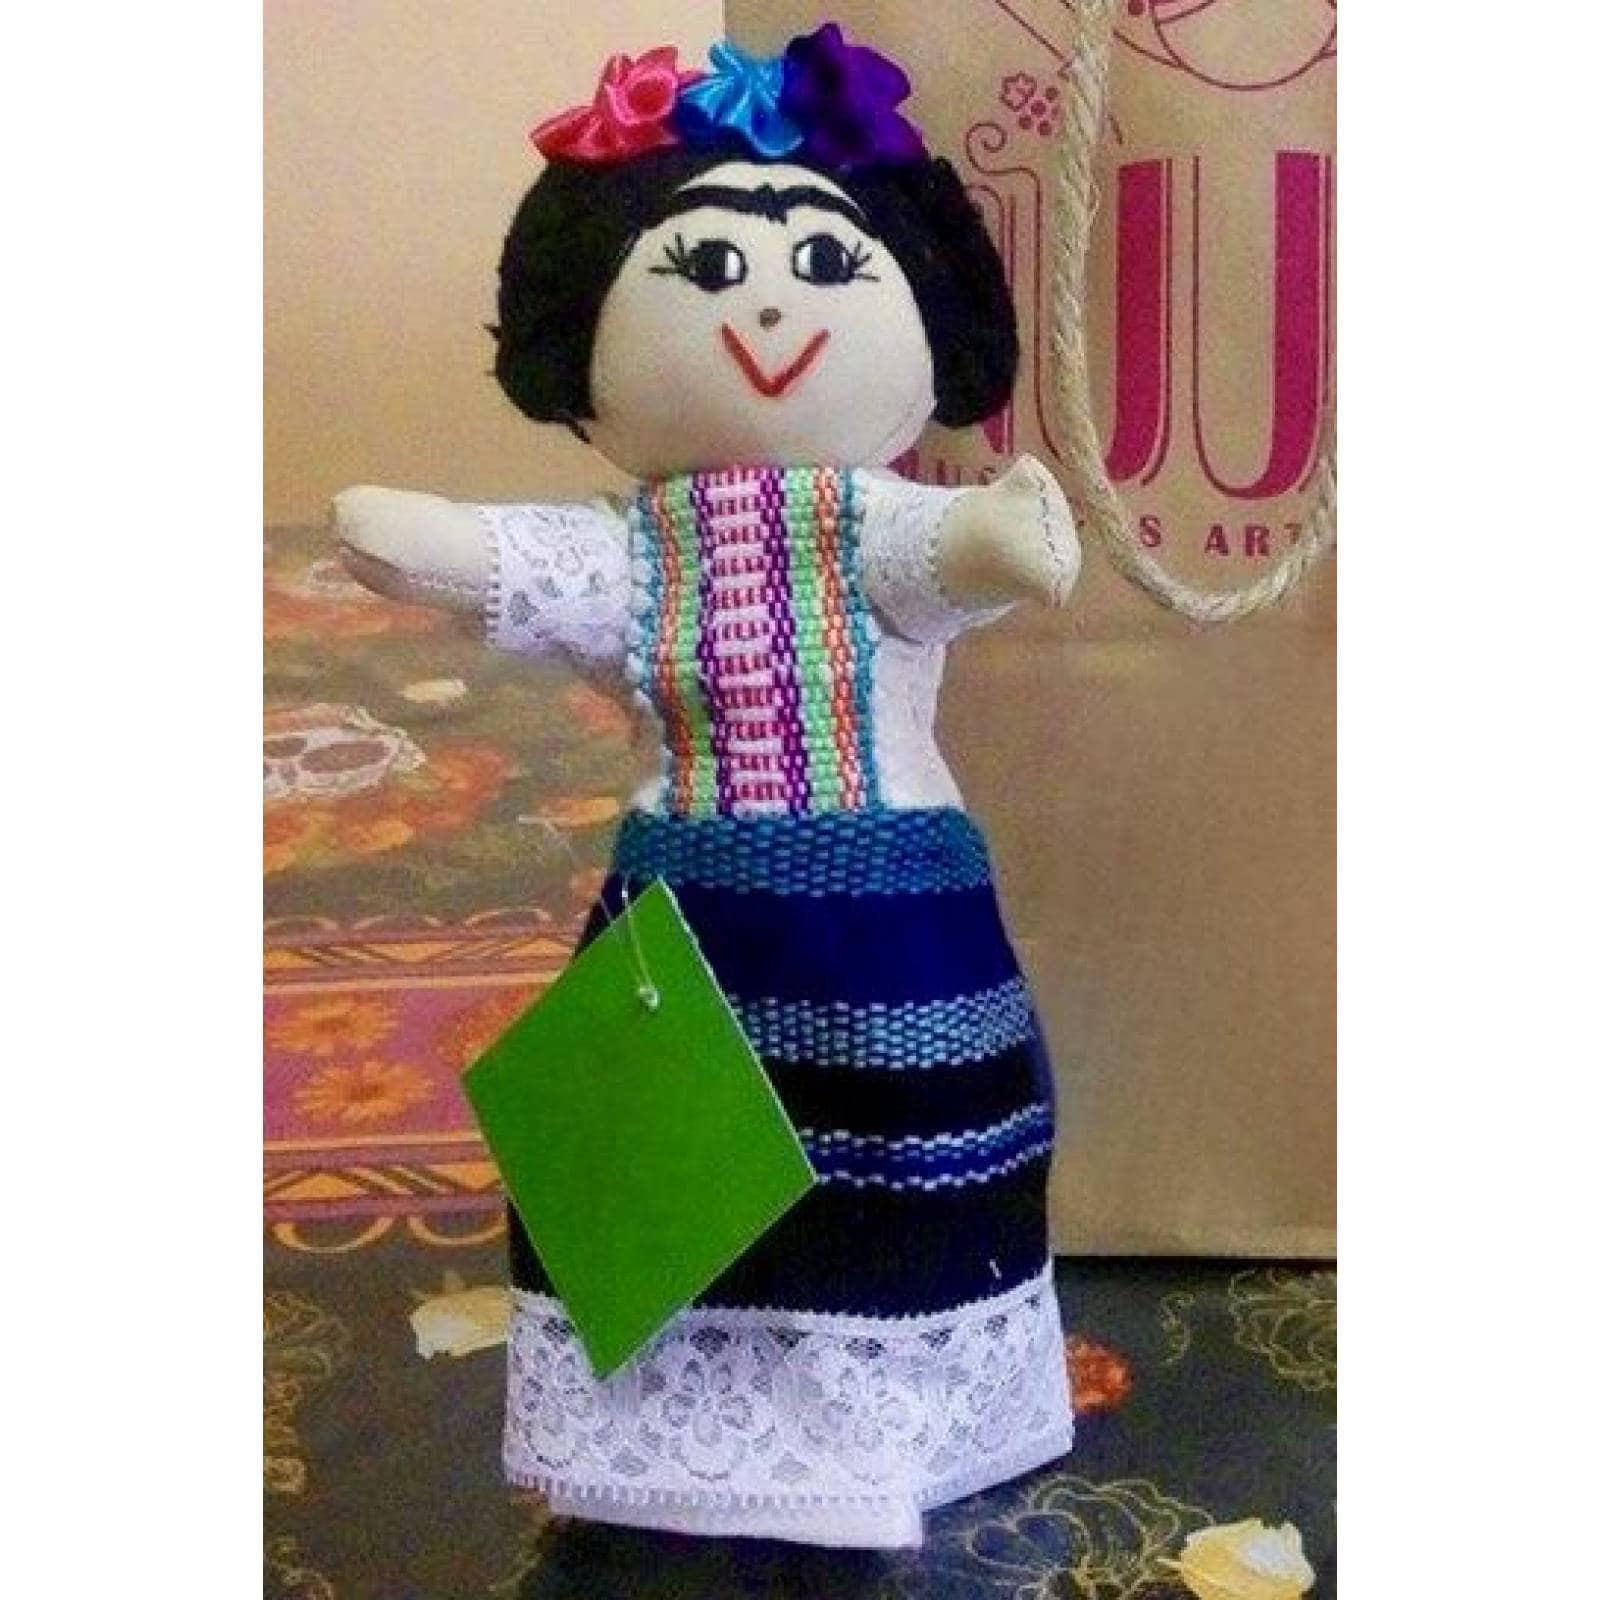 "Muñeca Artesanal De Tela "" Frida, Mujer Con Carácter"""